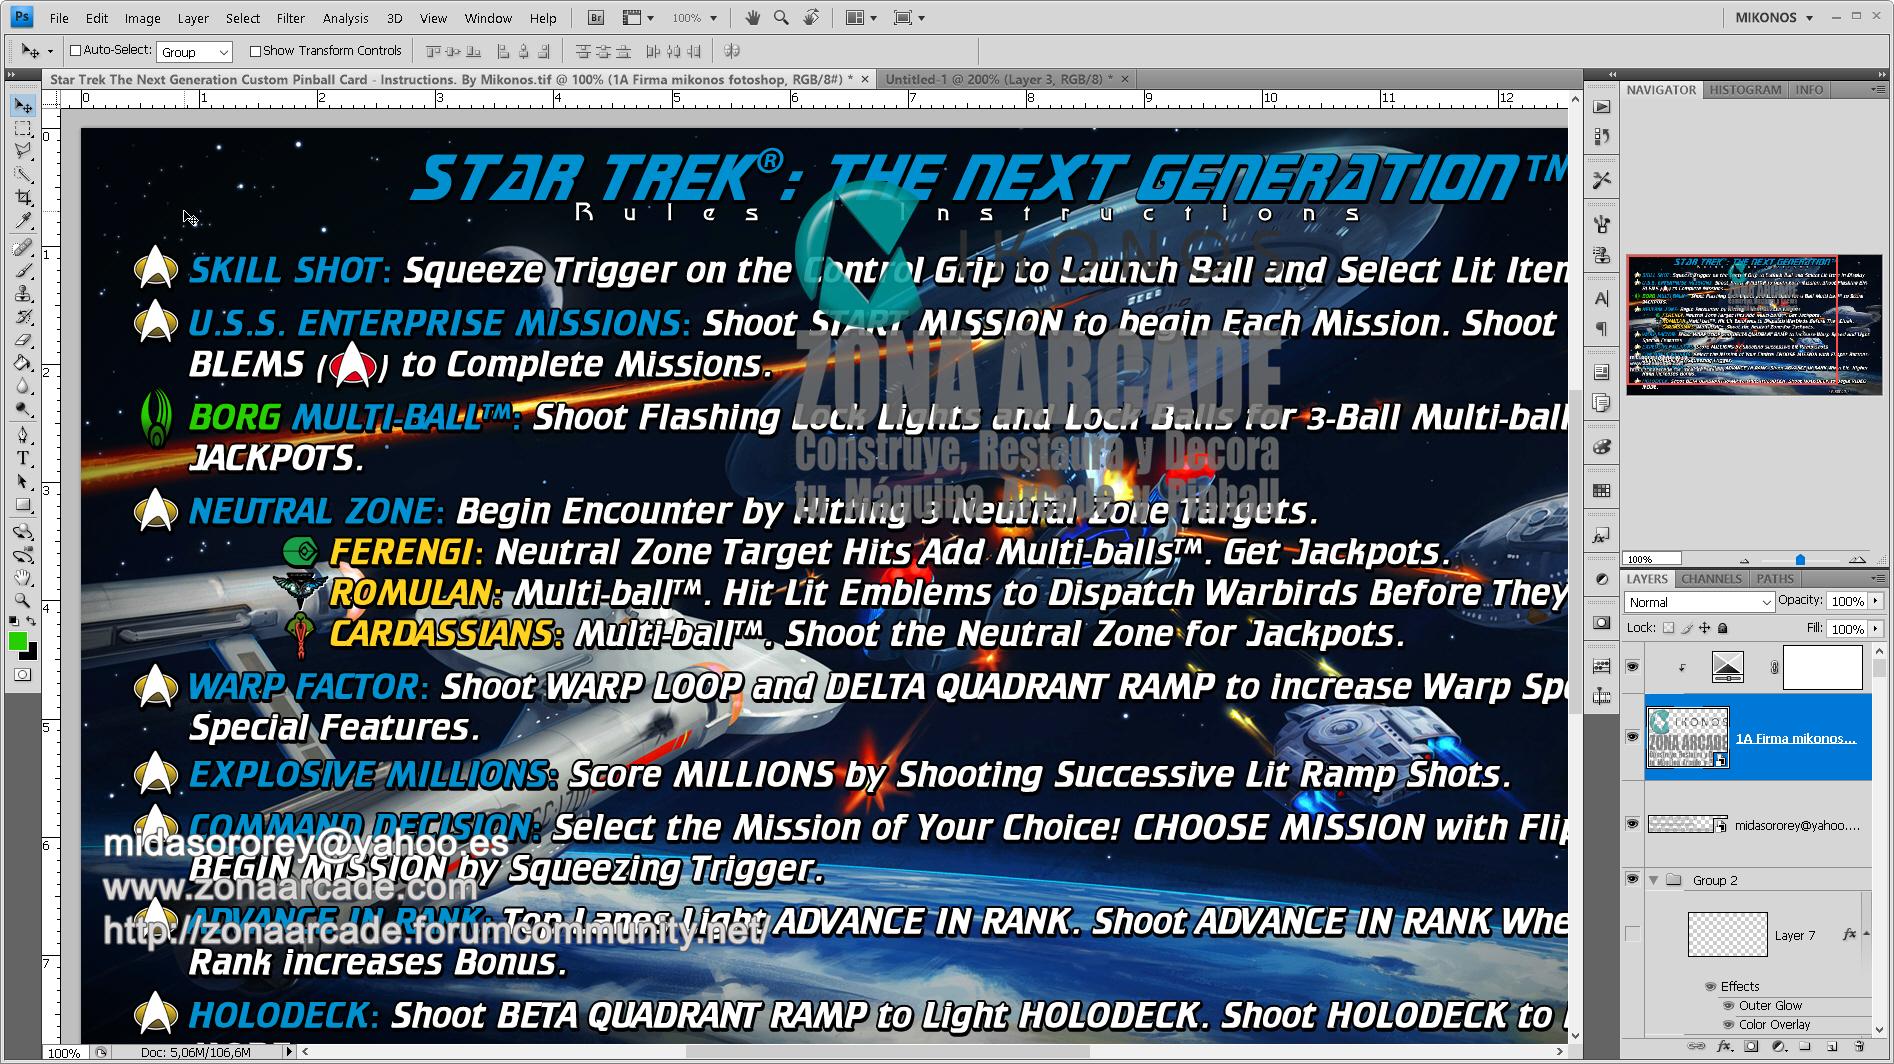 Star%20Trek%20The%20Next%20Generation%20Pinball%20Card%20-%20Instructions3.%20By%20Mikonos2.jpg